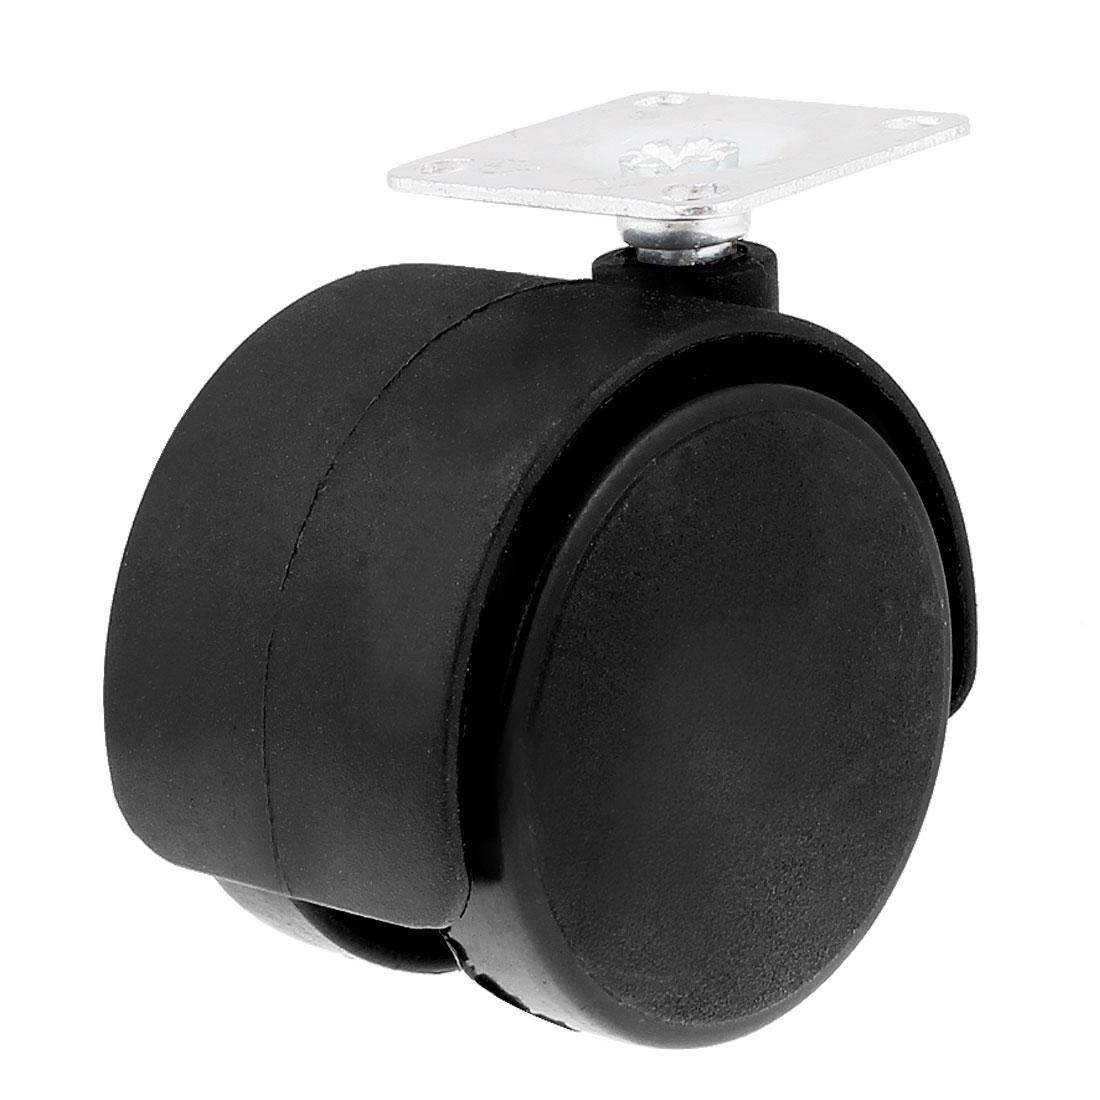 "Office Chair Metal Top Plate Twin Wheel Swivel Caster 1.9"" Black Silver Tone"